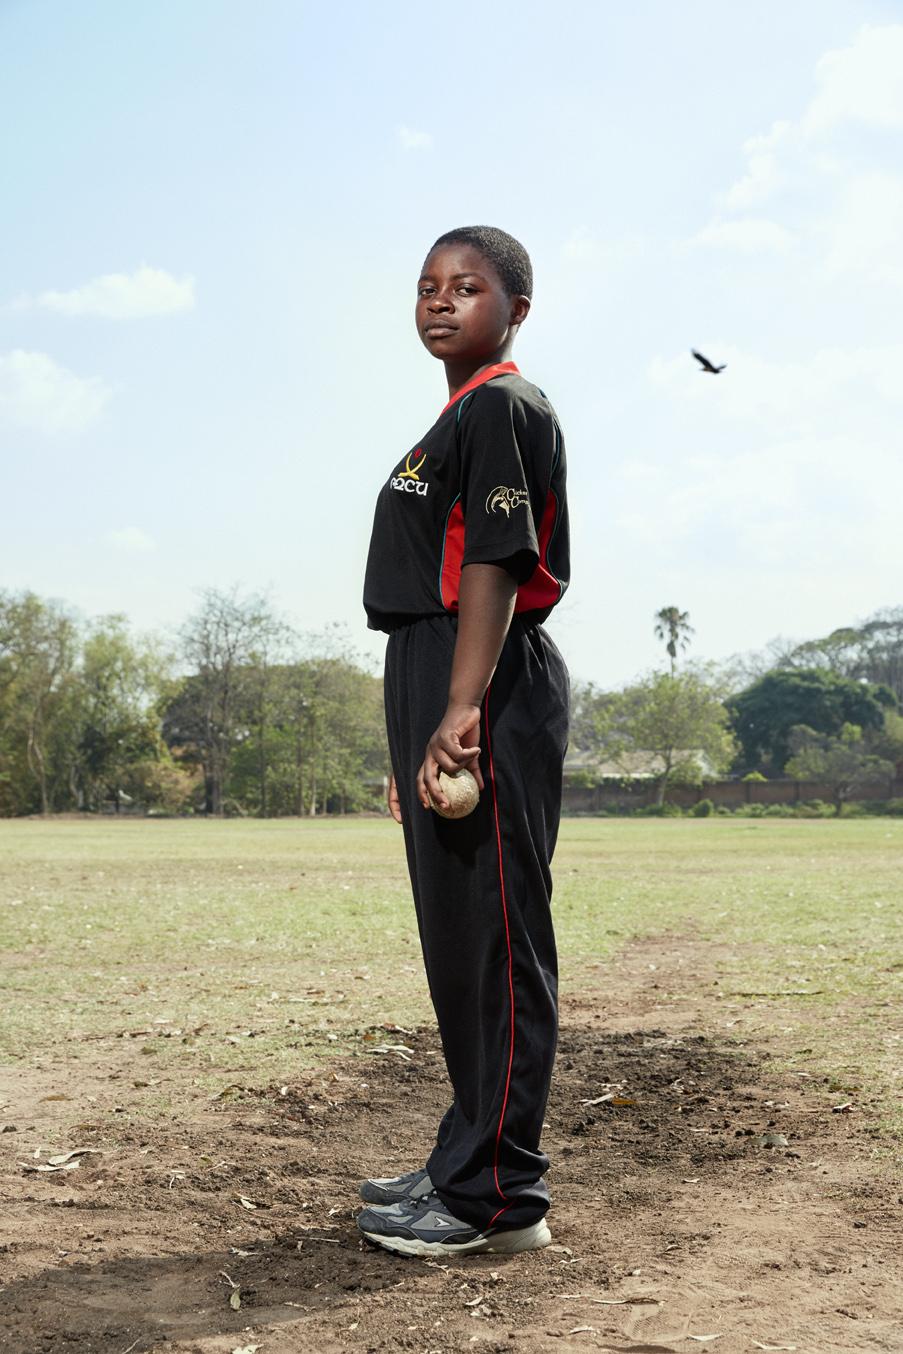 Brenda Ndipo, bowler